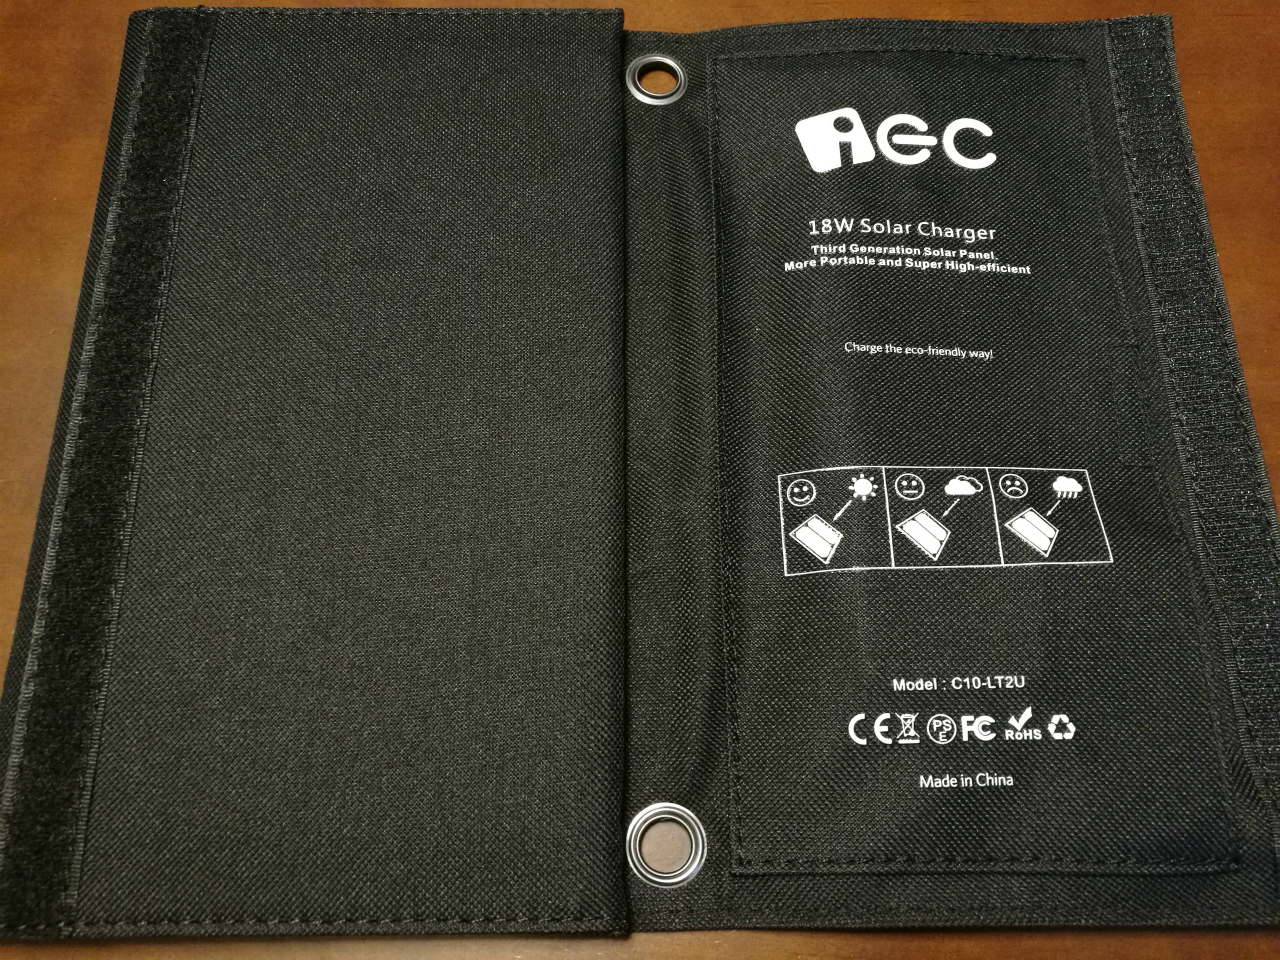 pr-ec-technology-18w-solar-charger-03